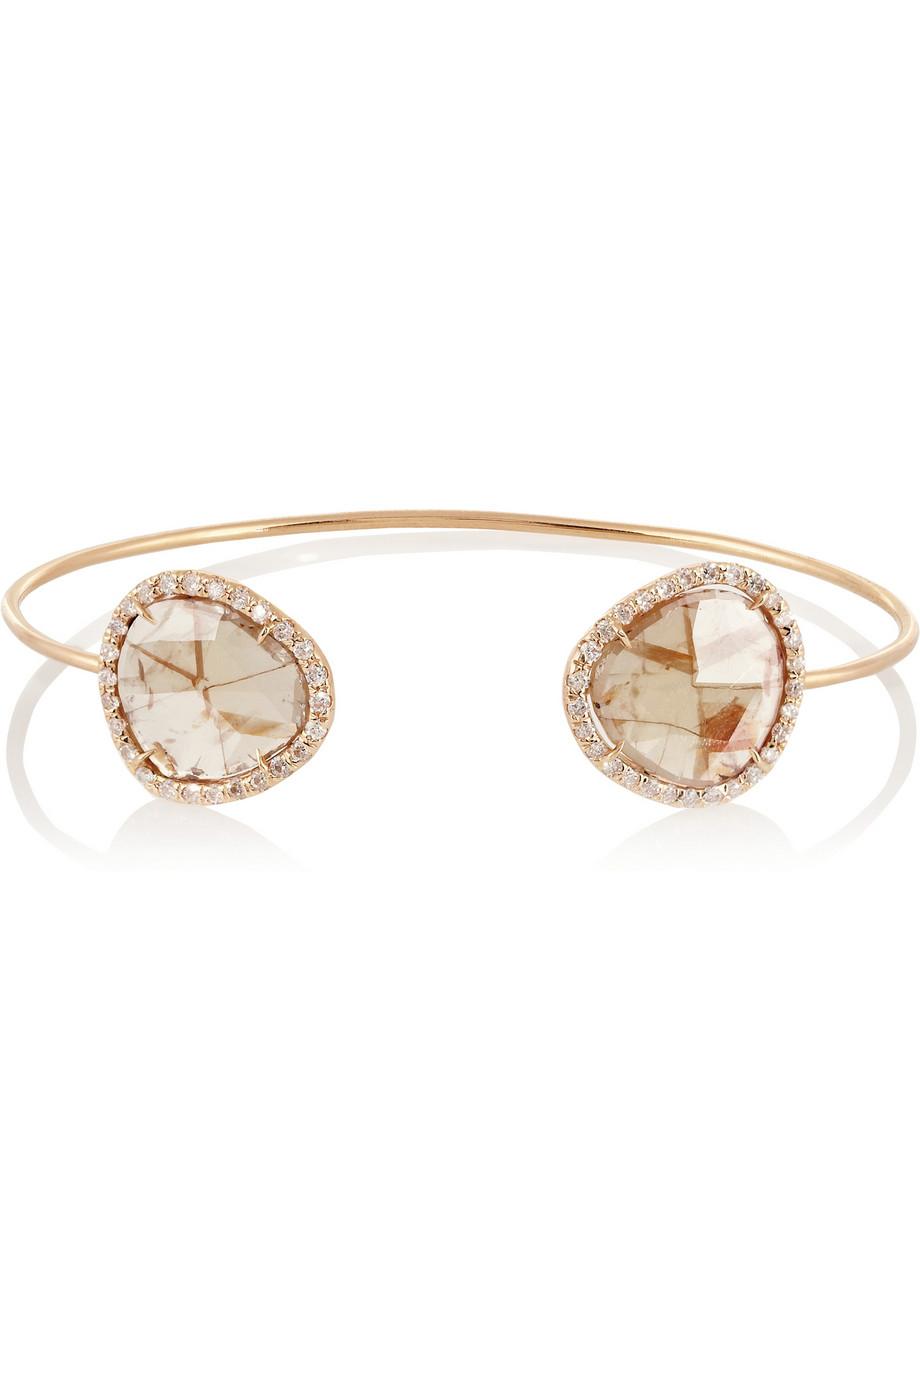 Kimberly McDonald Rose Gold Geode And Diamond Cuff LVAHExzsp